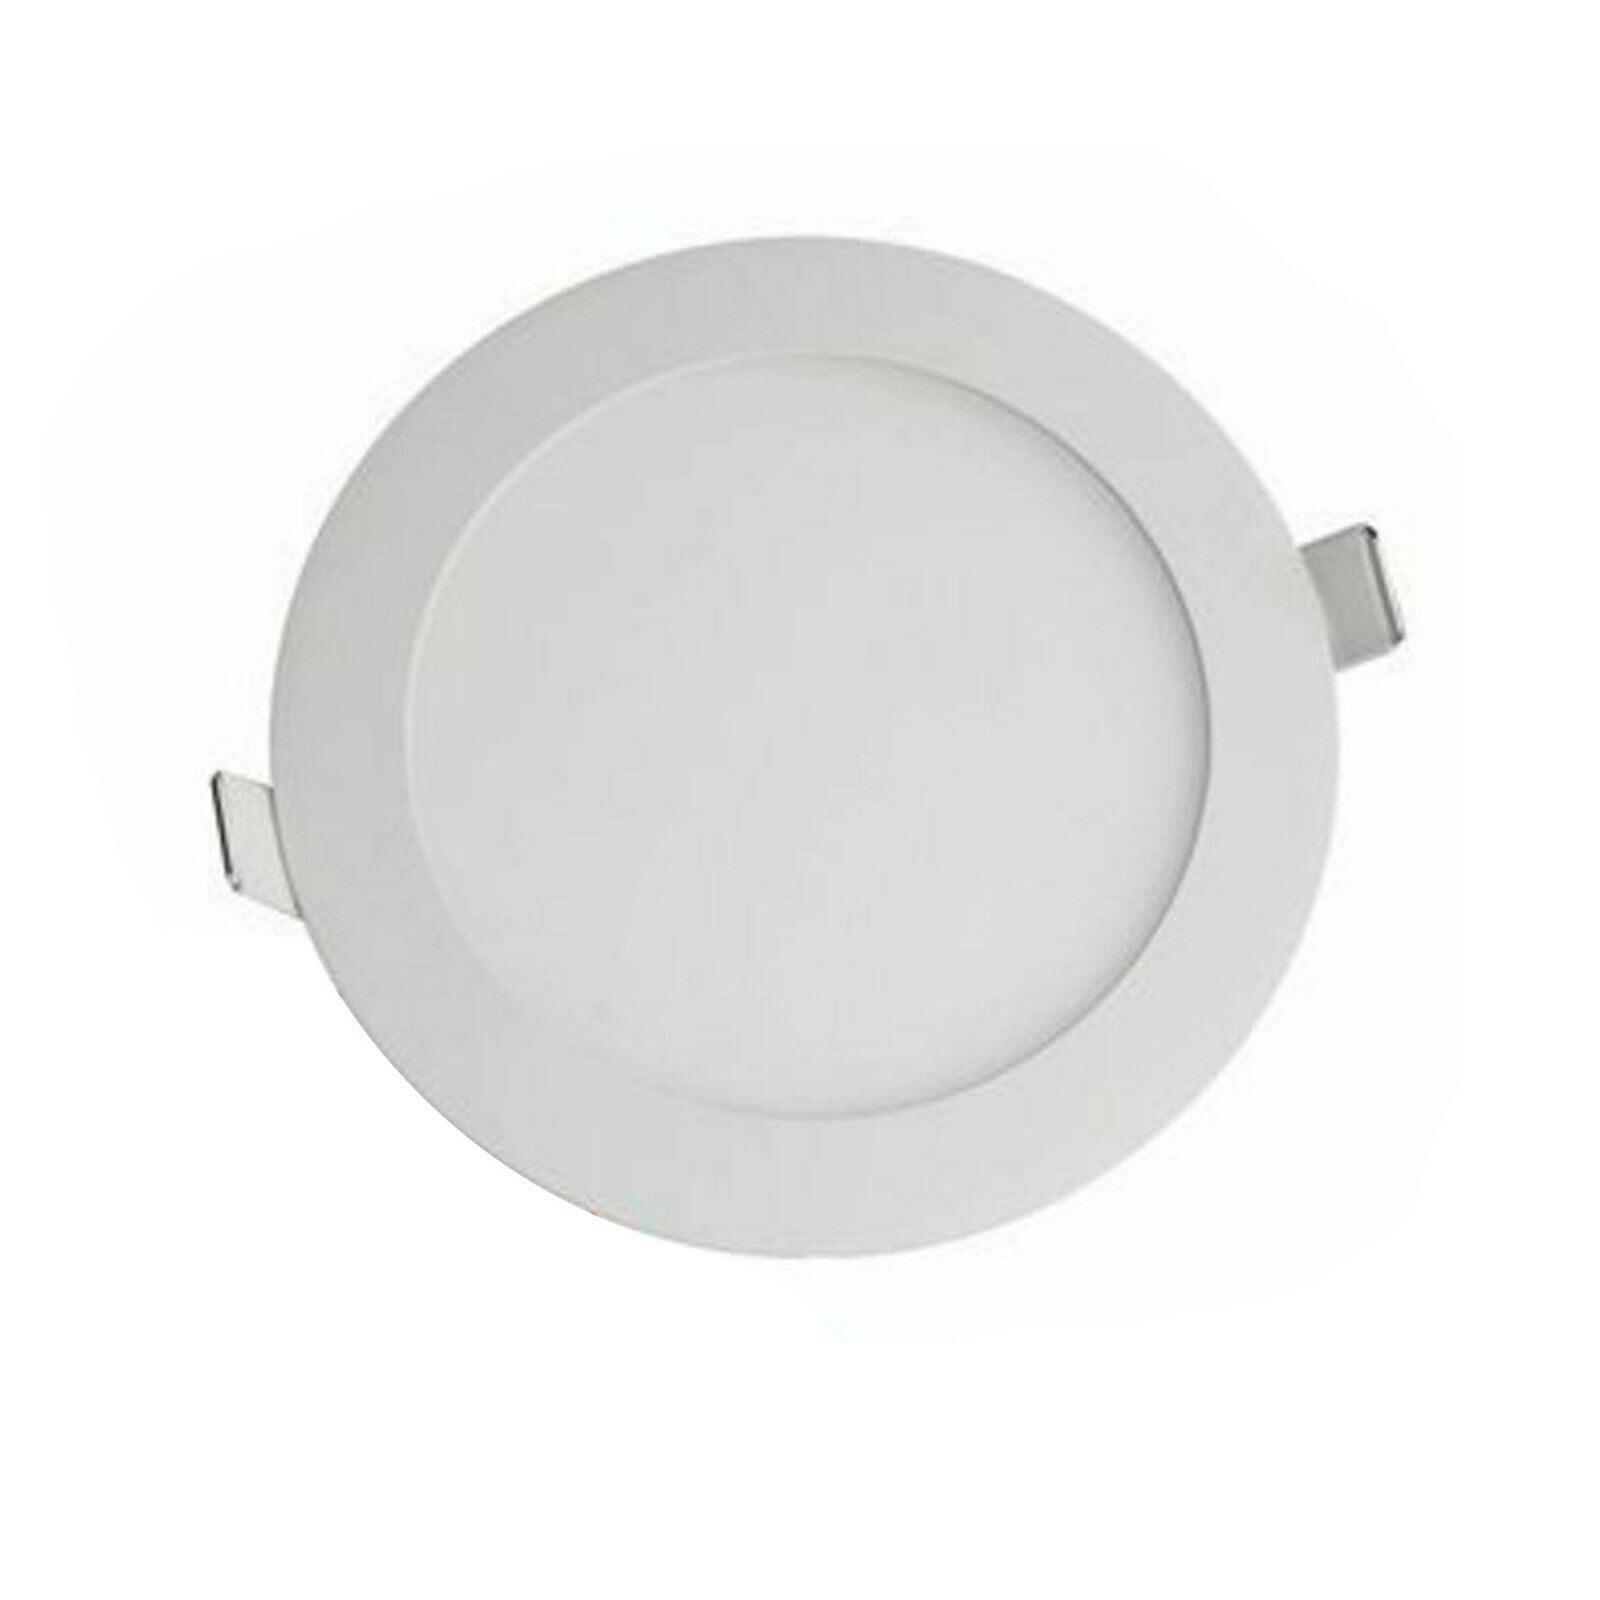 Round LED Recessed Ceiling Panel Lighting Weiß 12 Watt Light 3000K Stylish x 10